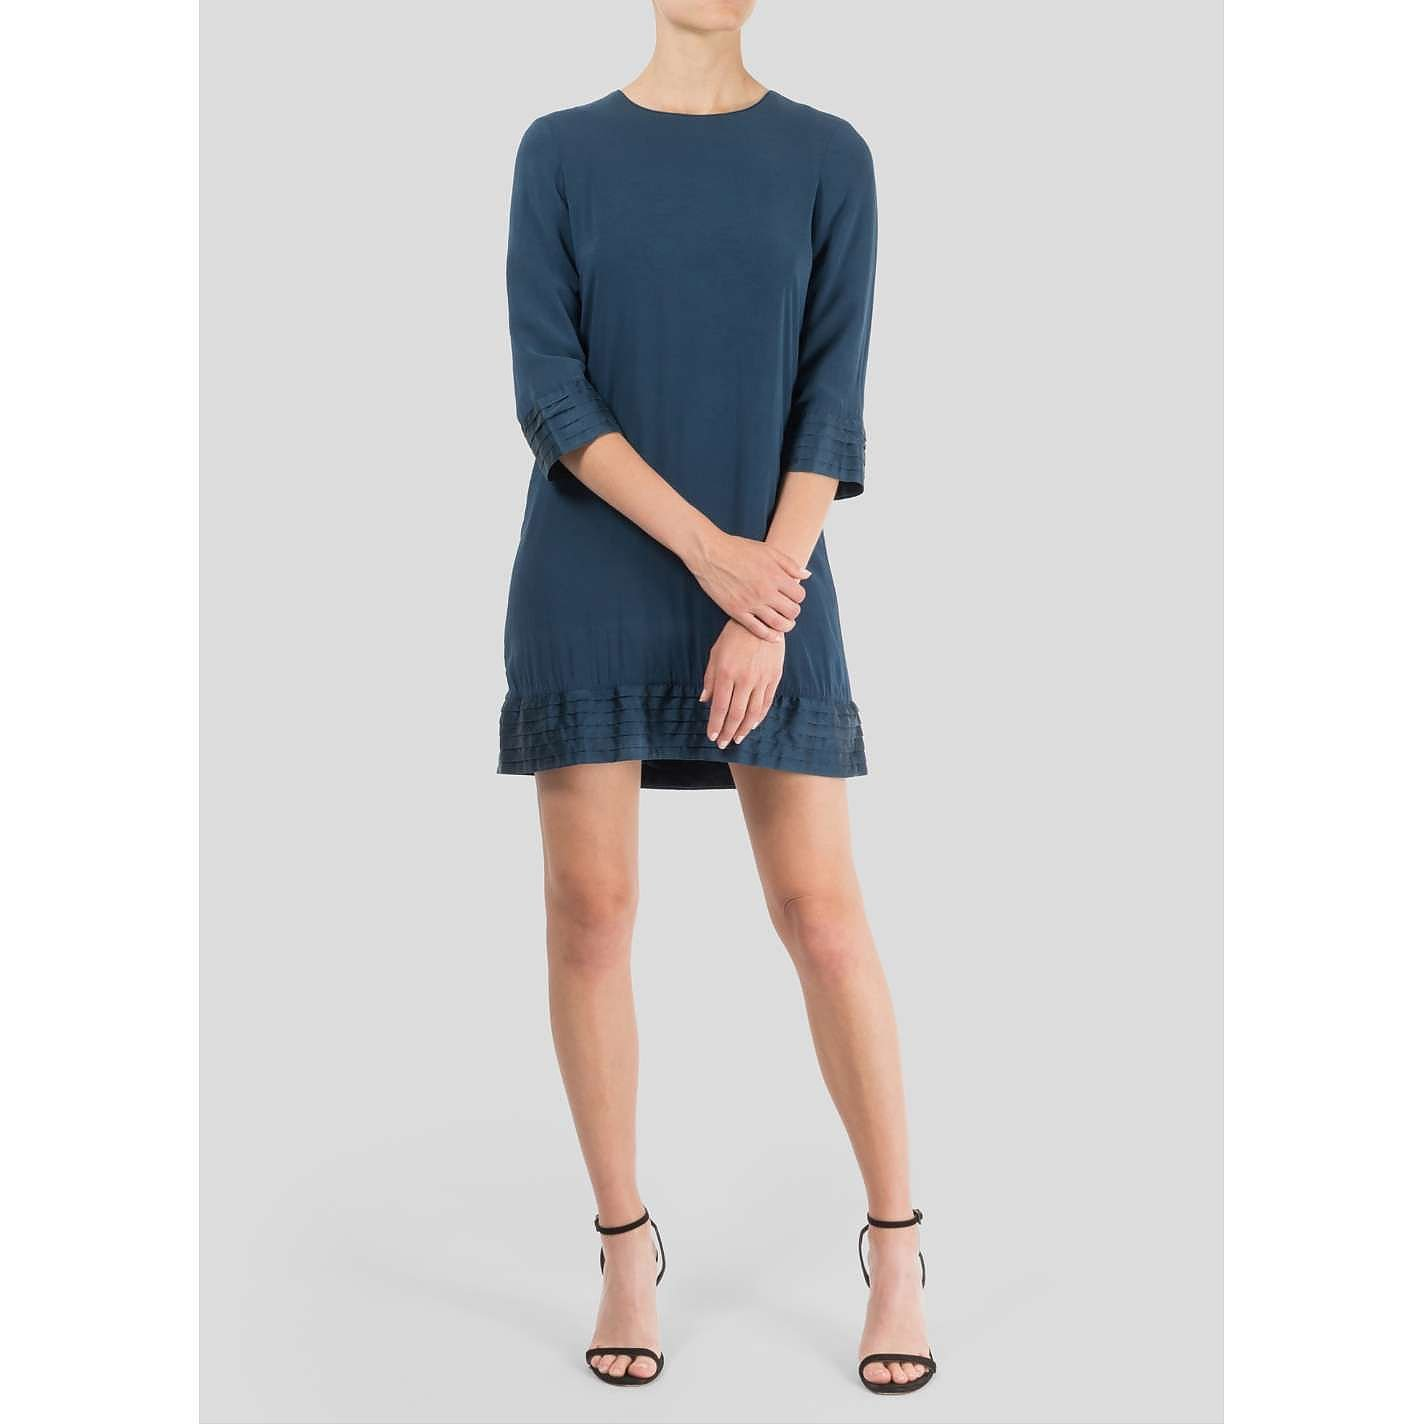 Burberry Pleat-Trim Dress